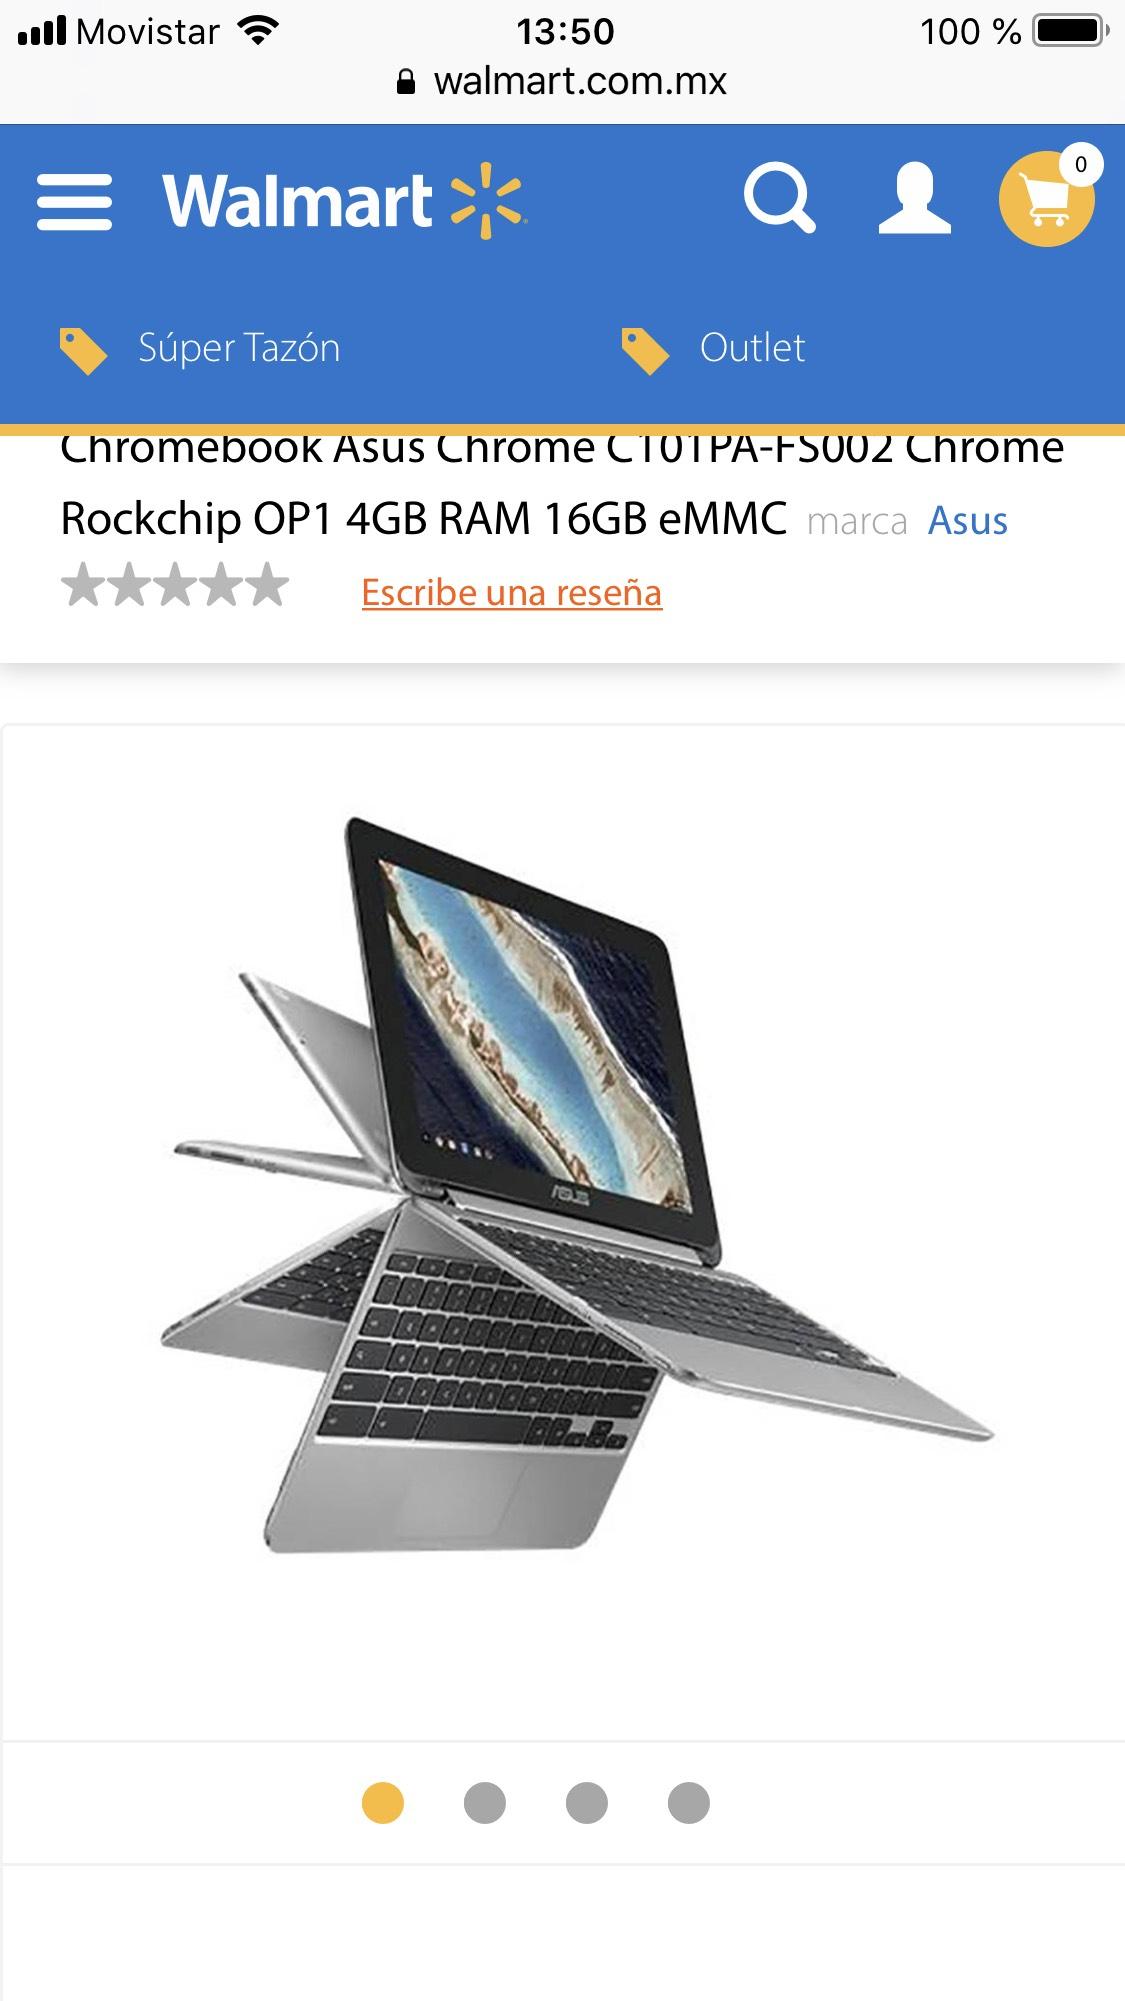 Walmart: Chromebook Asus Chrome C101PA-FS002